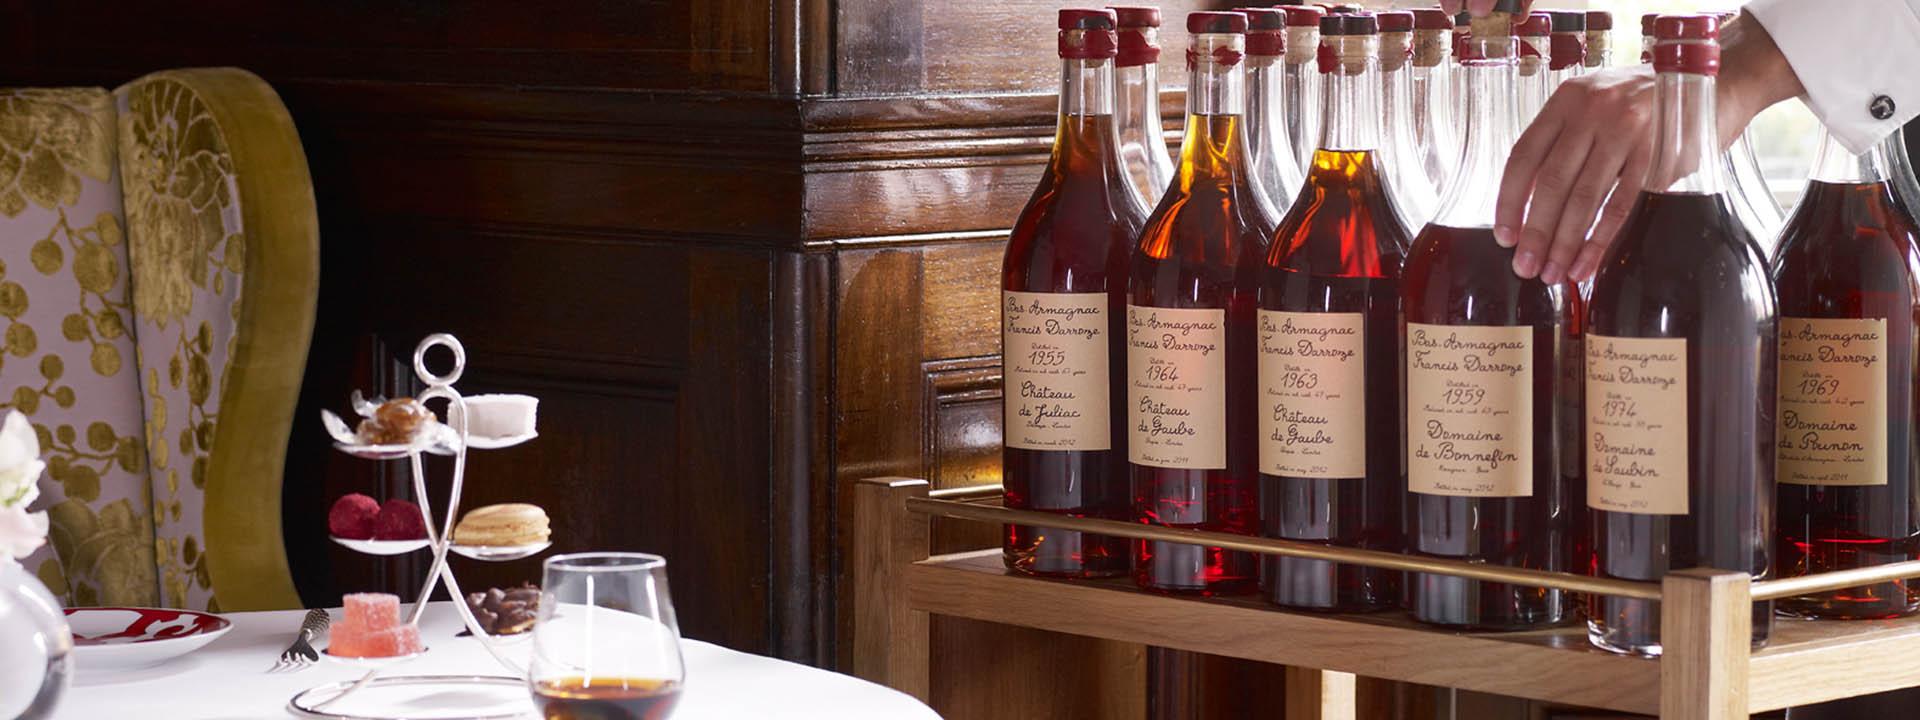 Hélène Darozze vintage wines